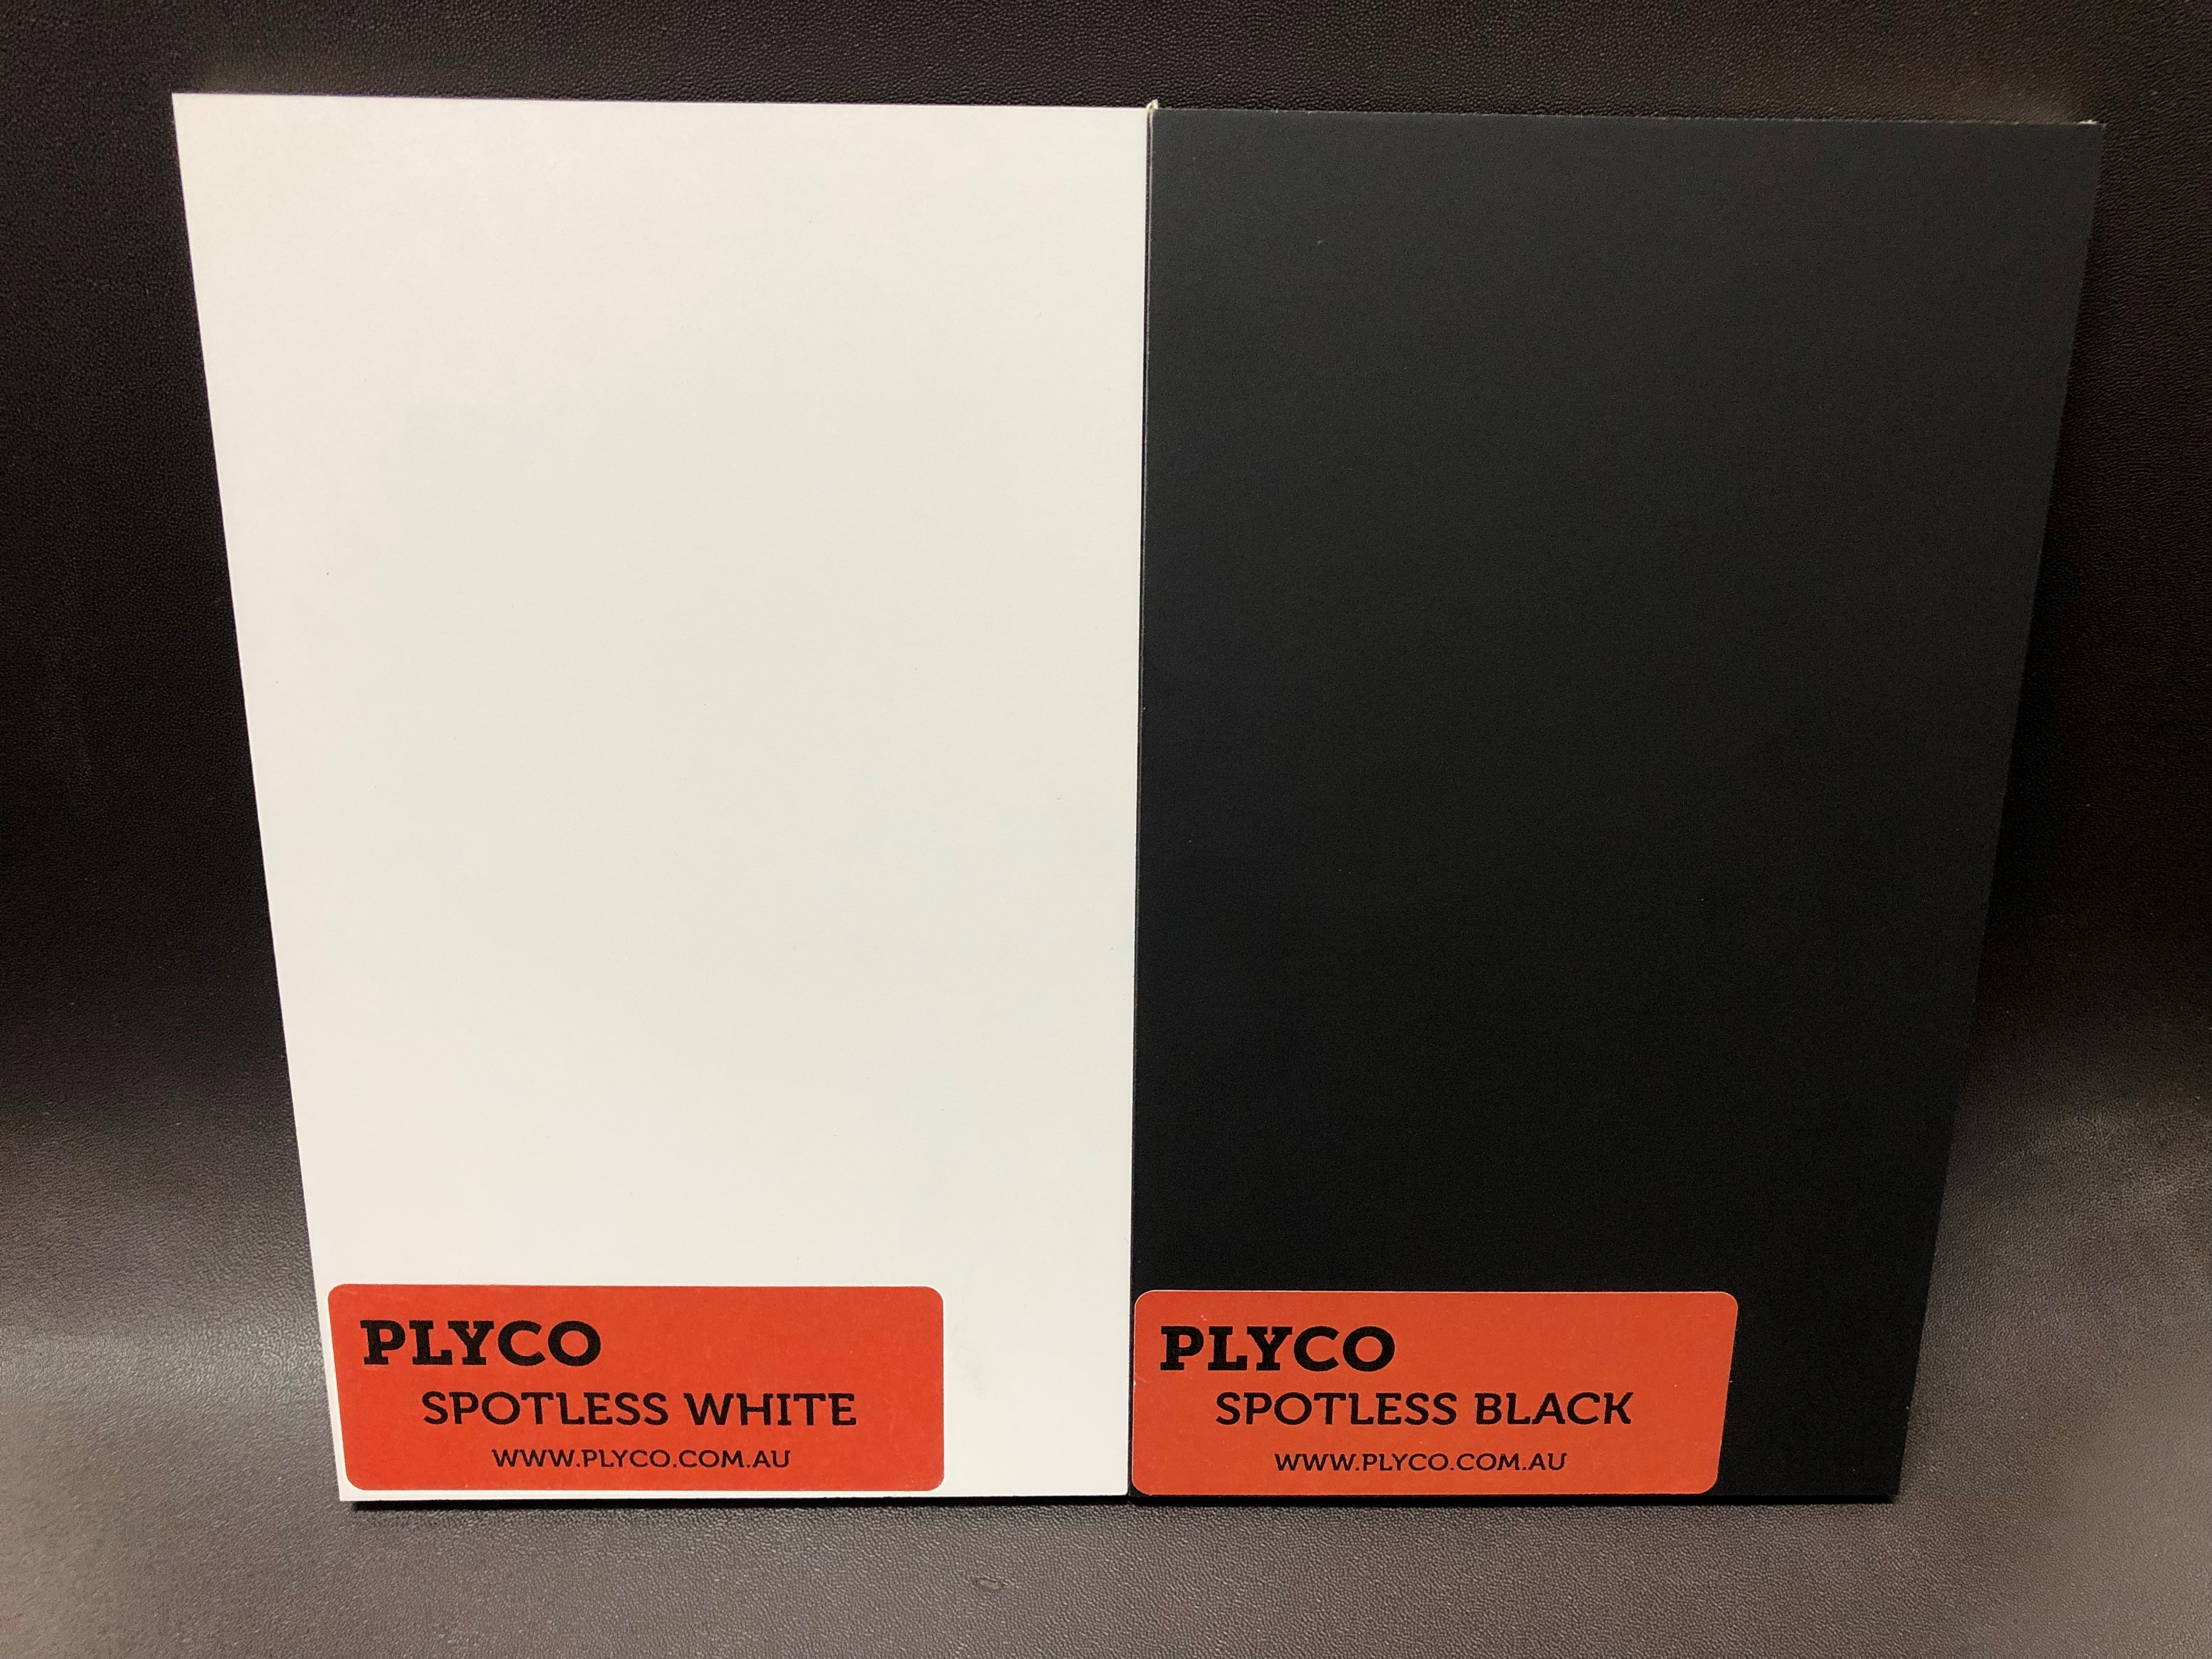 Spotless Laminate Black and White Laminated Plywood